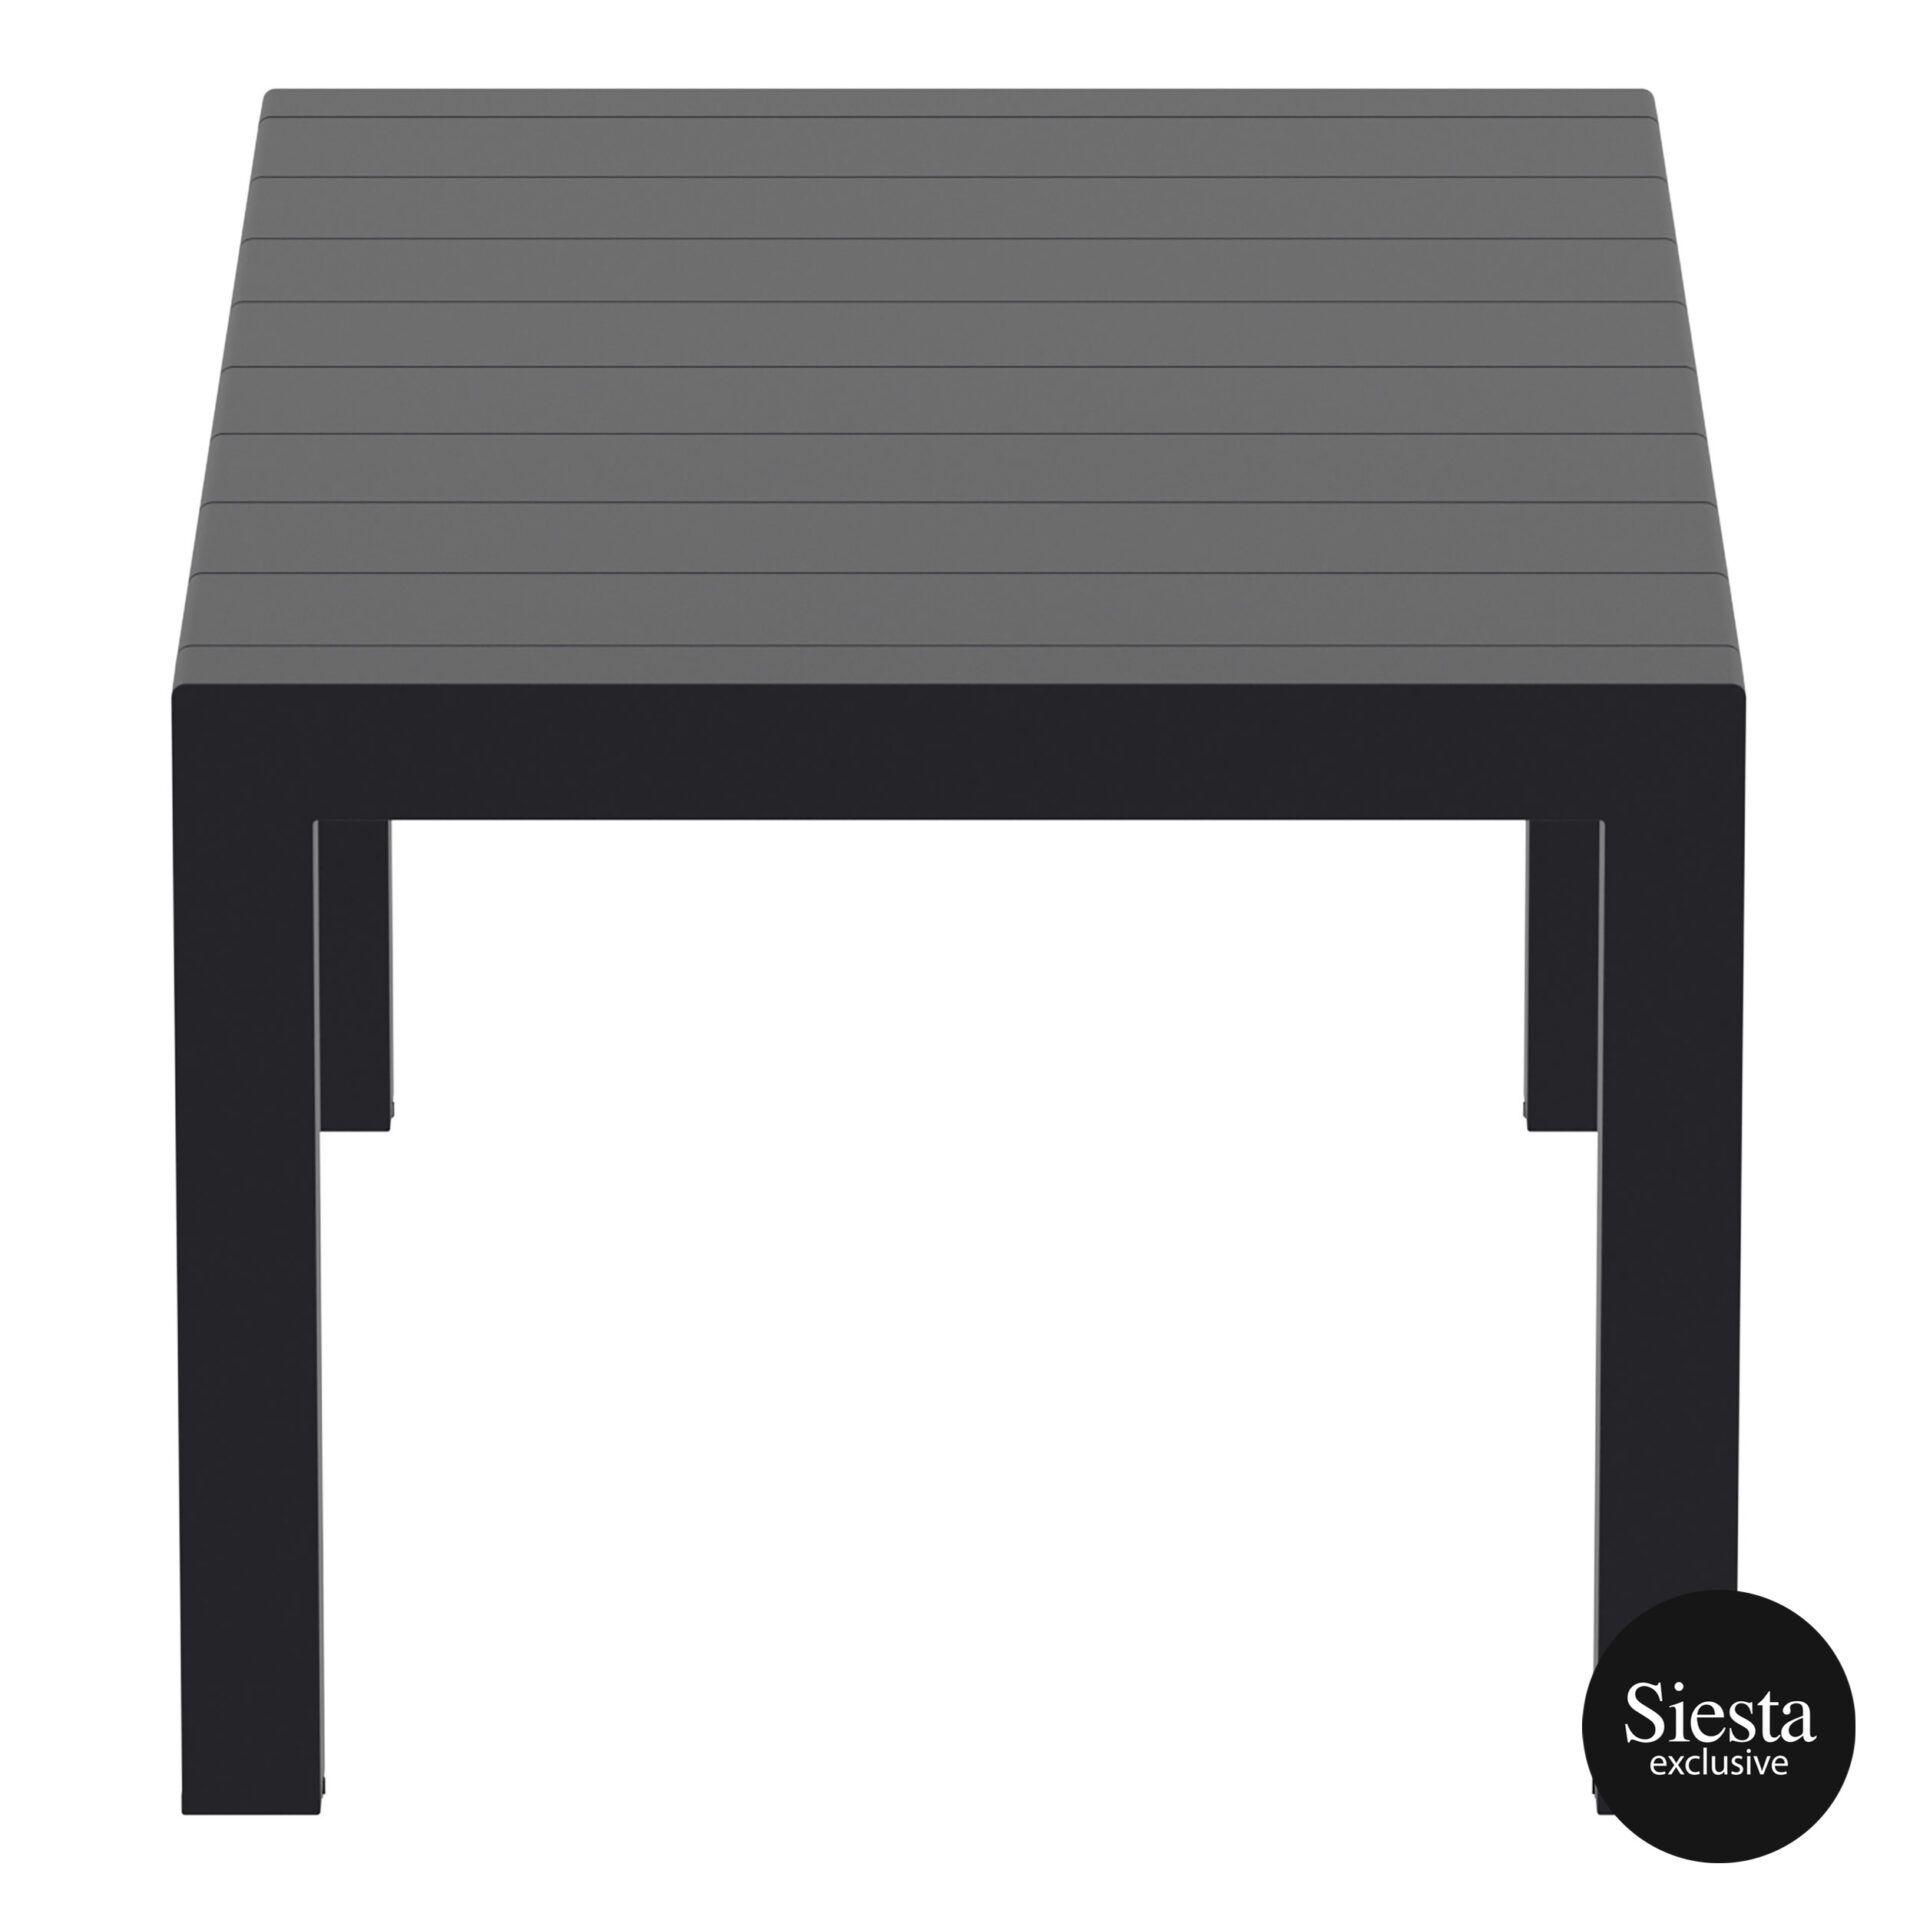 003 vegas table medium 180 black short edge